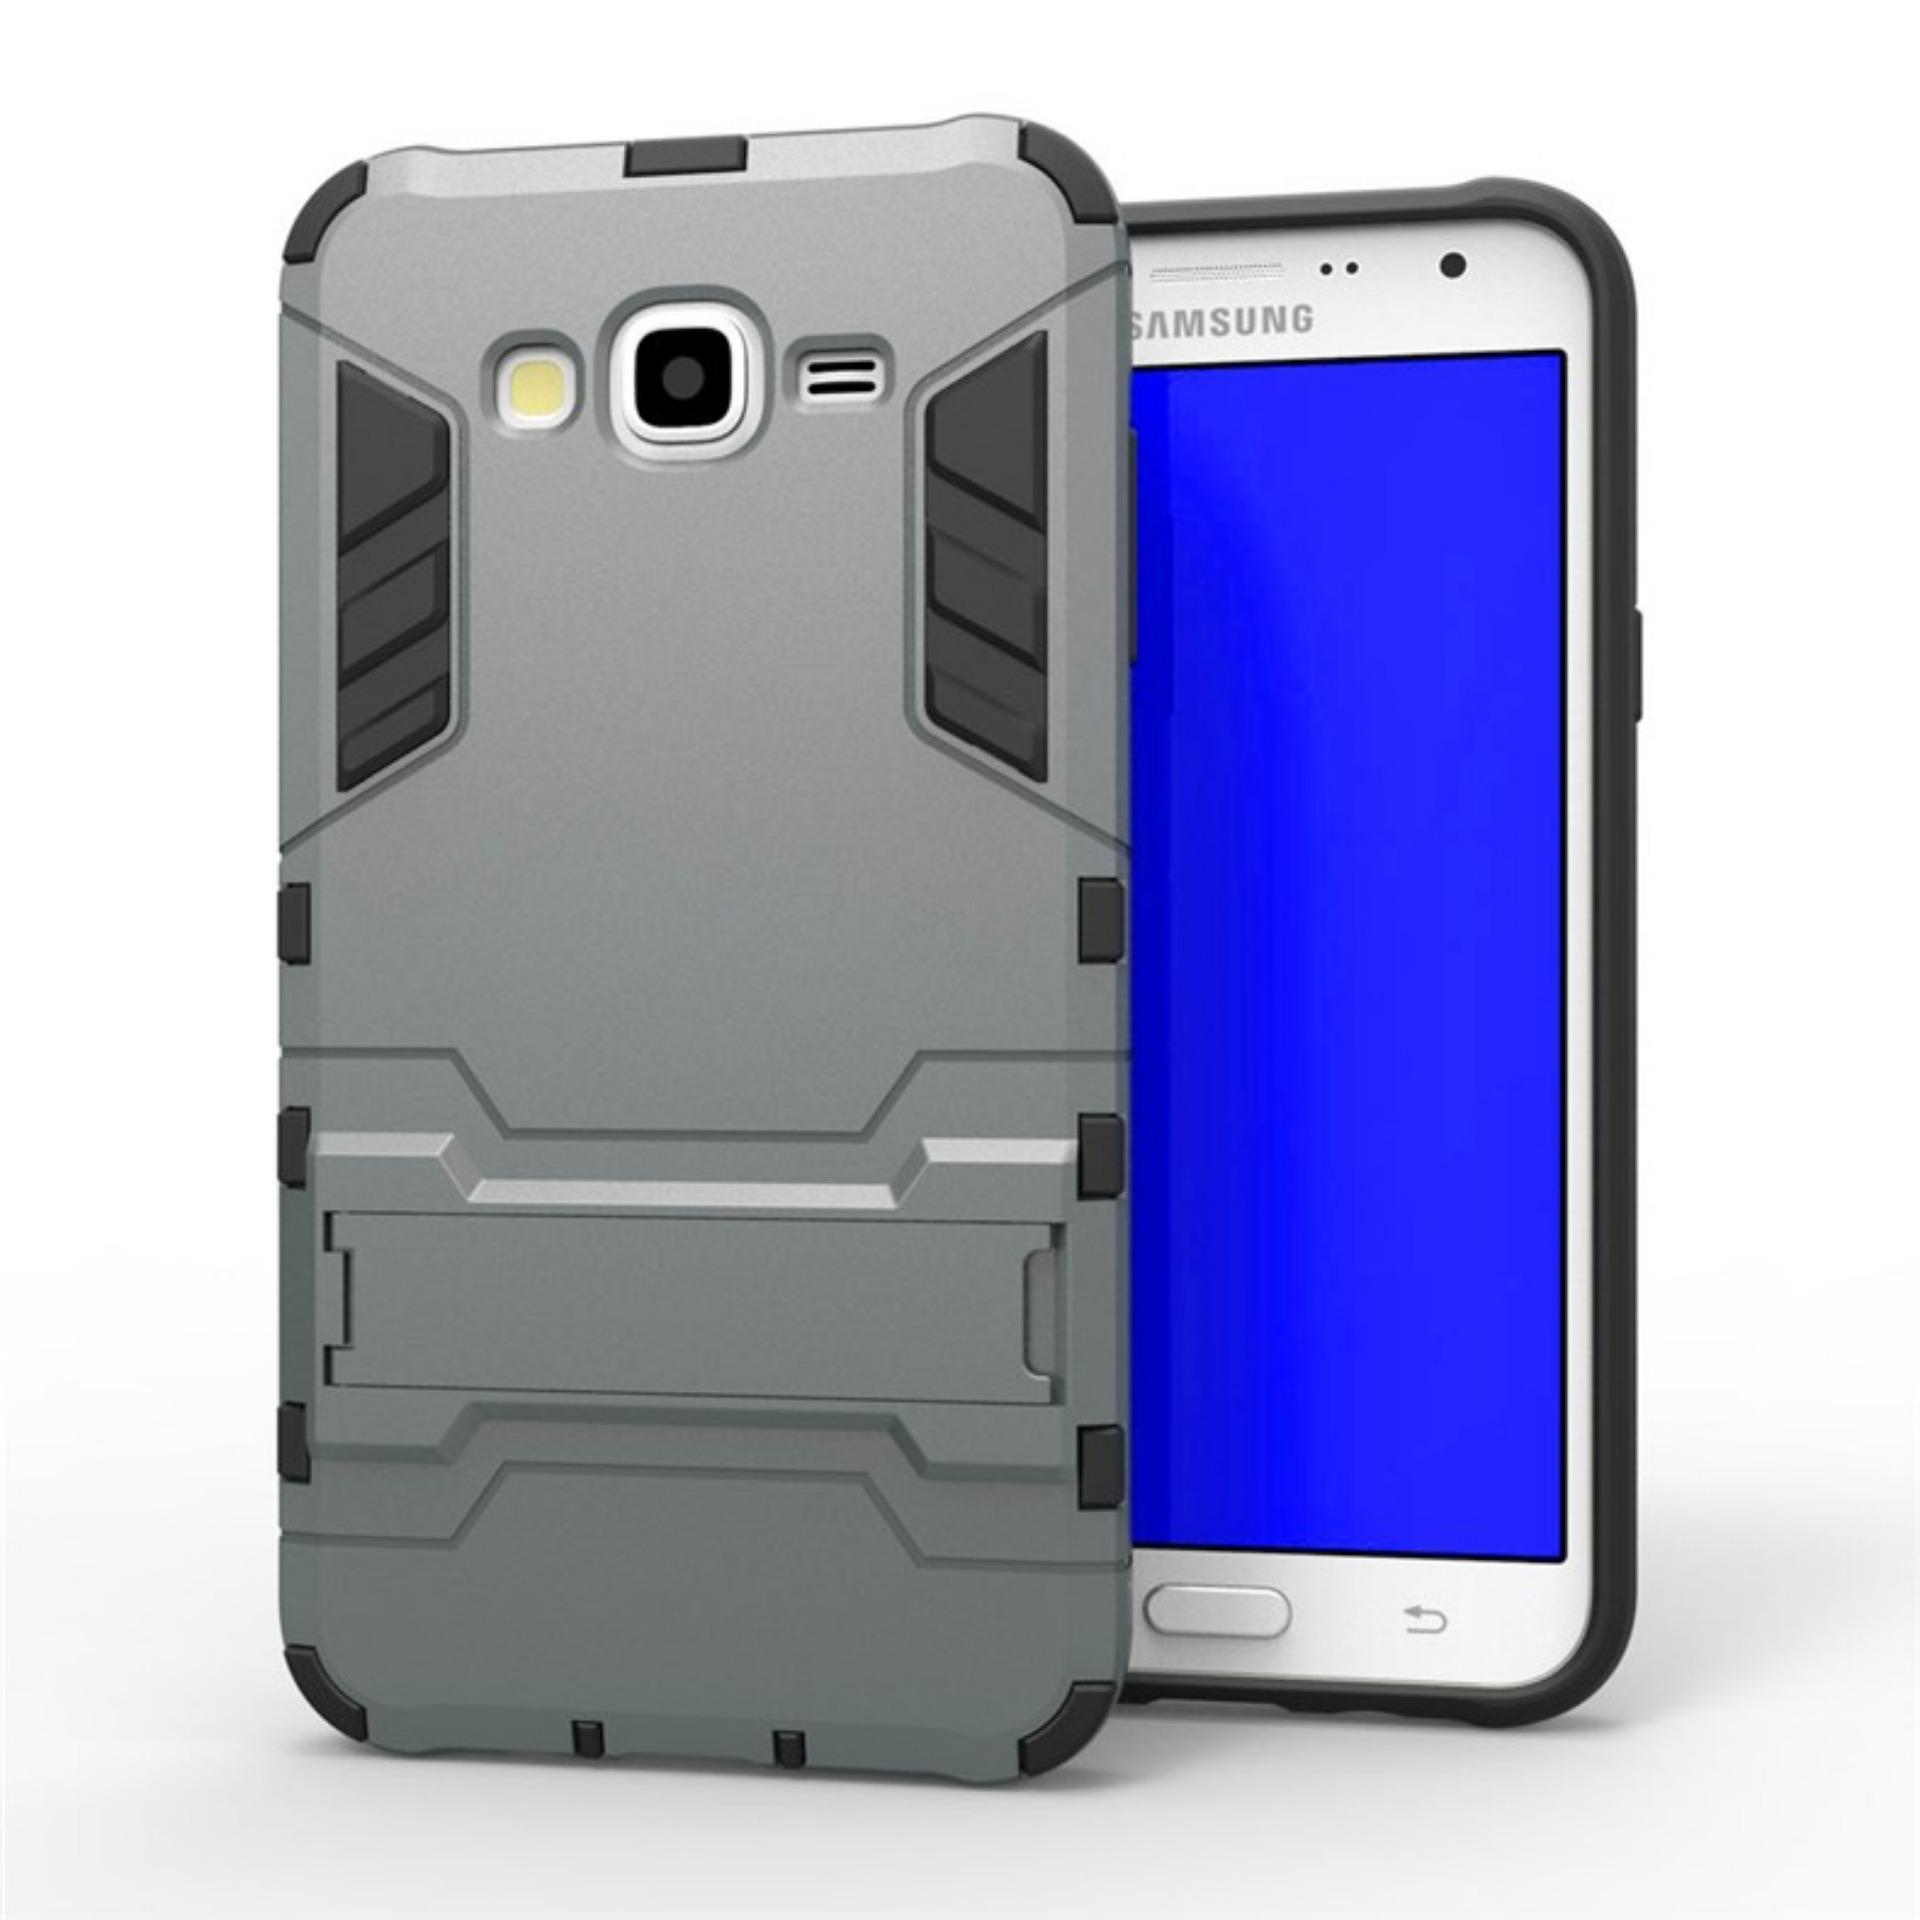 Case Ironman Kickstand For Samsung Galaxy J2 (J200) Grey